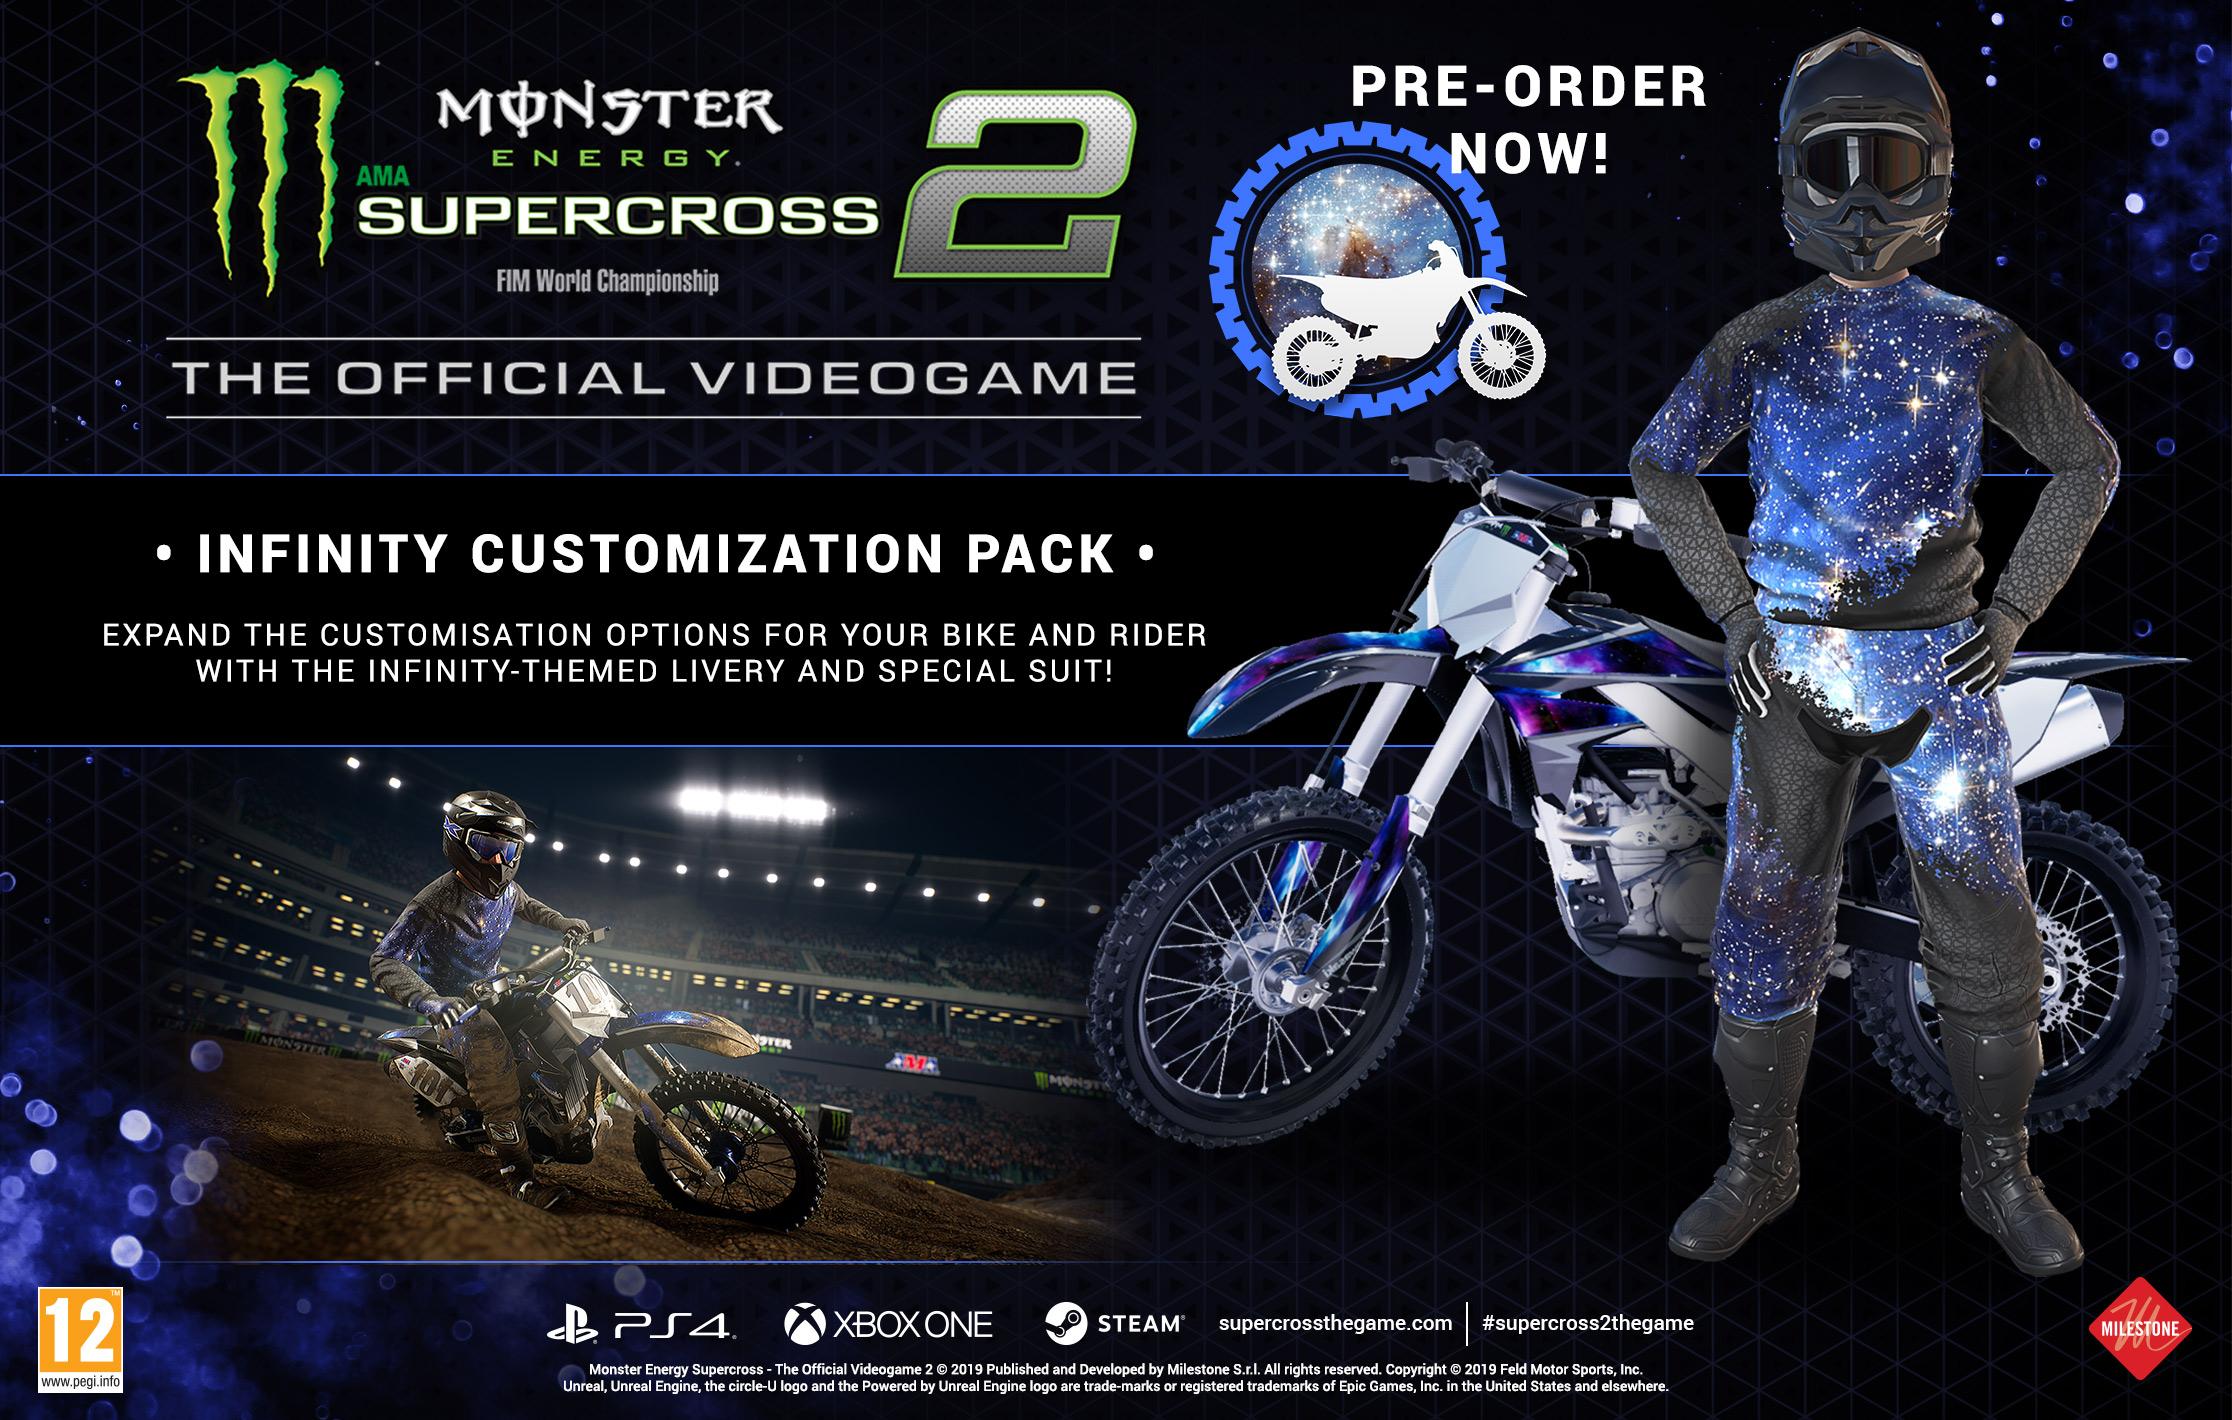 News - Monster Energy Supercross - The Official Videogame 3